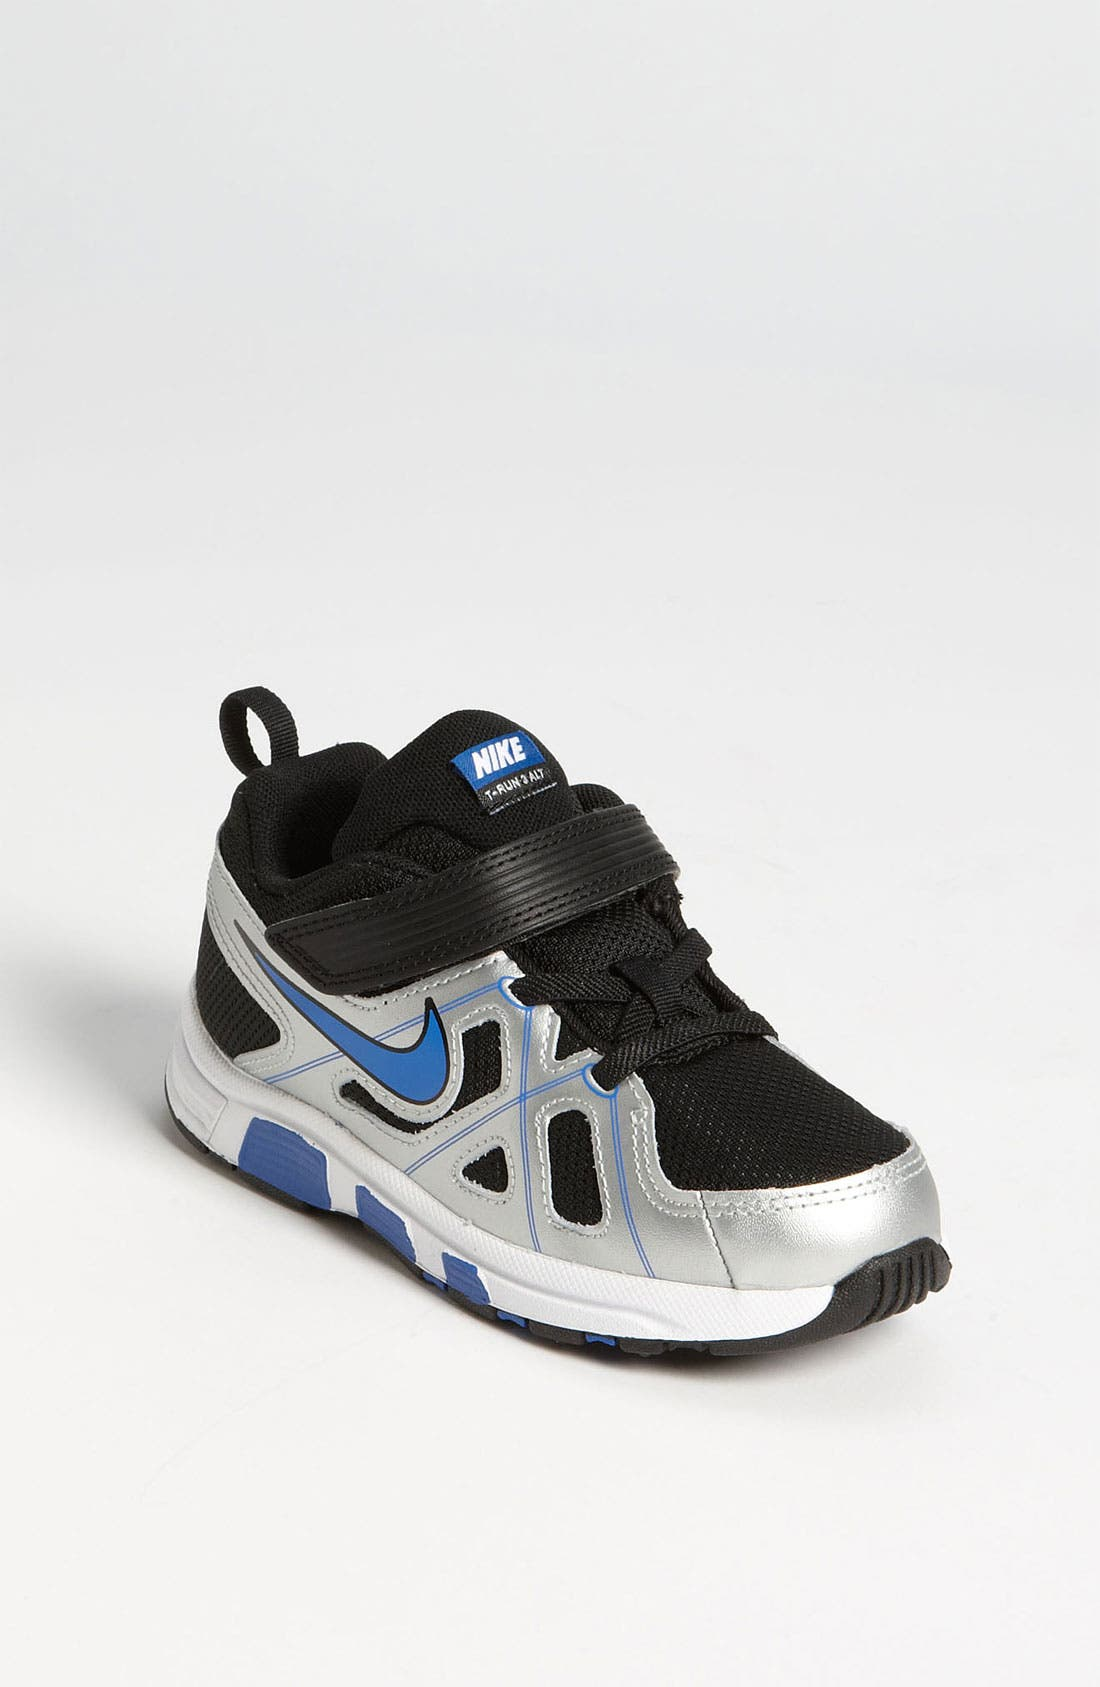 Main Image - Nike 'T-Run 3 Alt' Running Shoe (Baby, Walker & Toddler) (Special Purchase)